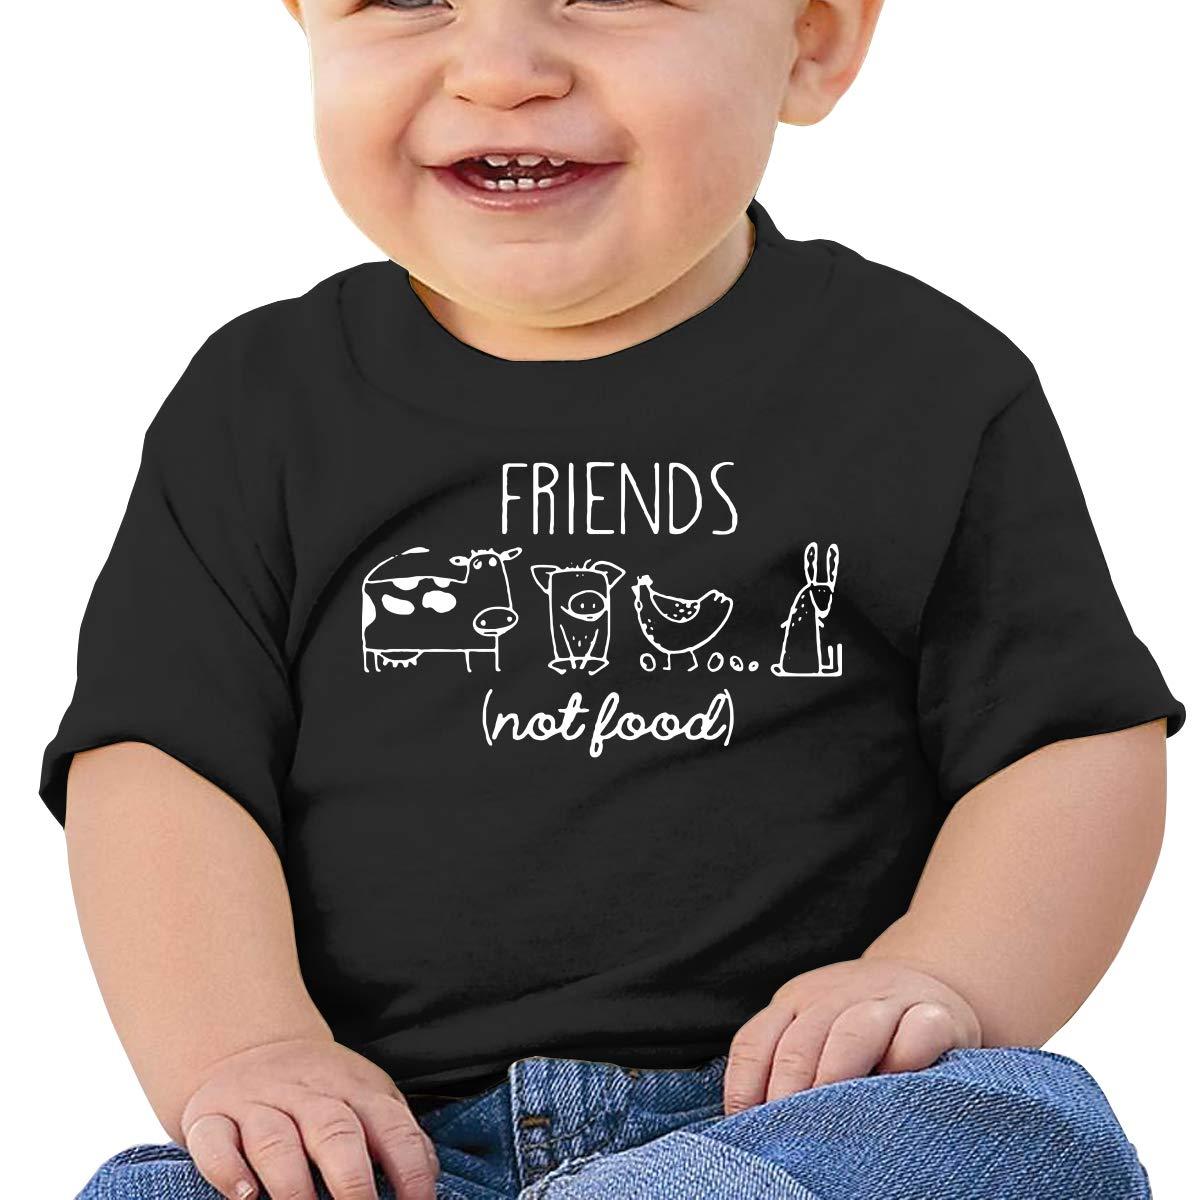 Vegan Vegetarian Animal Lover Baby Boys Girls Short Sleeve Crew Neck T-Shirt 6-18 Month Tops